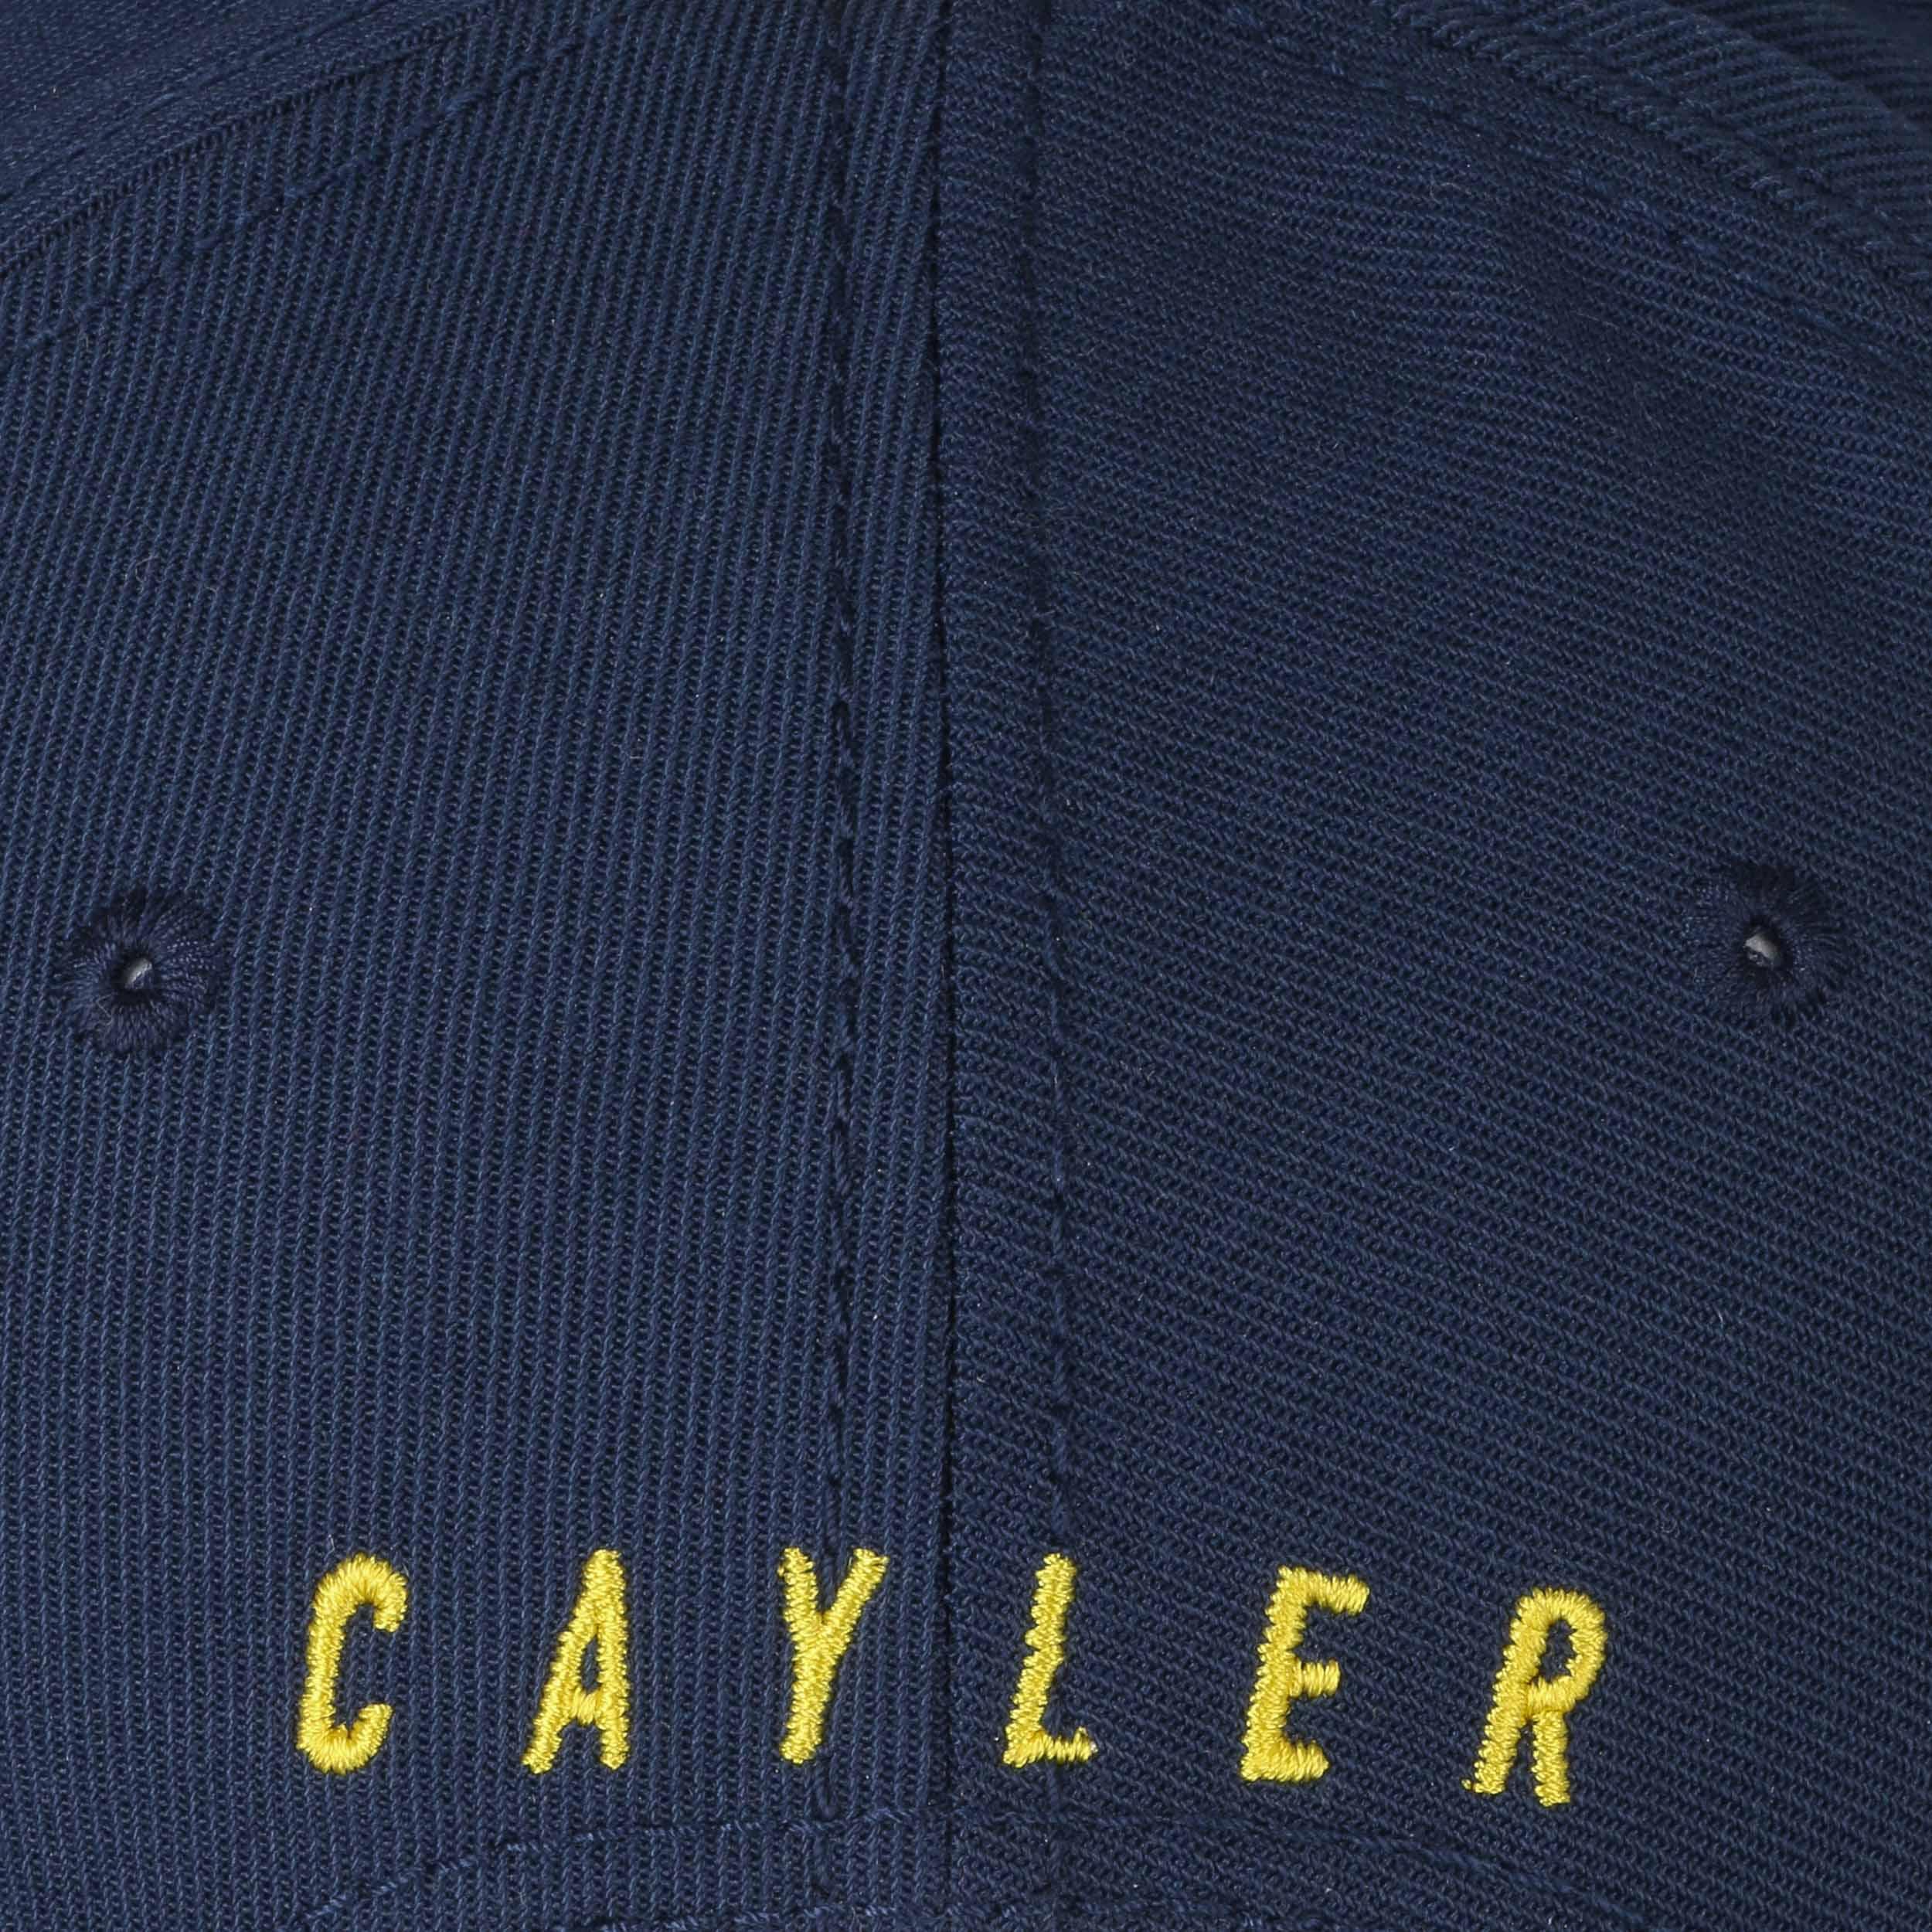 Gorra Brooklyn Athletics by Cayler   Sons - Gorras - sombreroshop.es f6231ccecfe